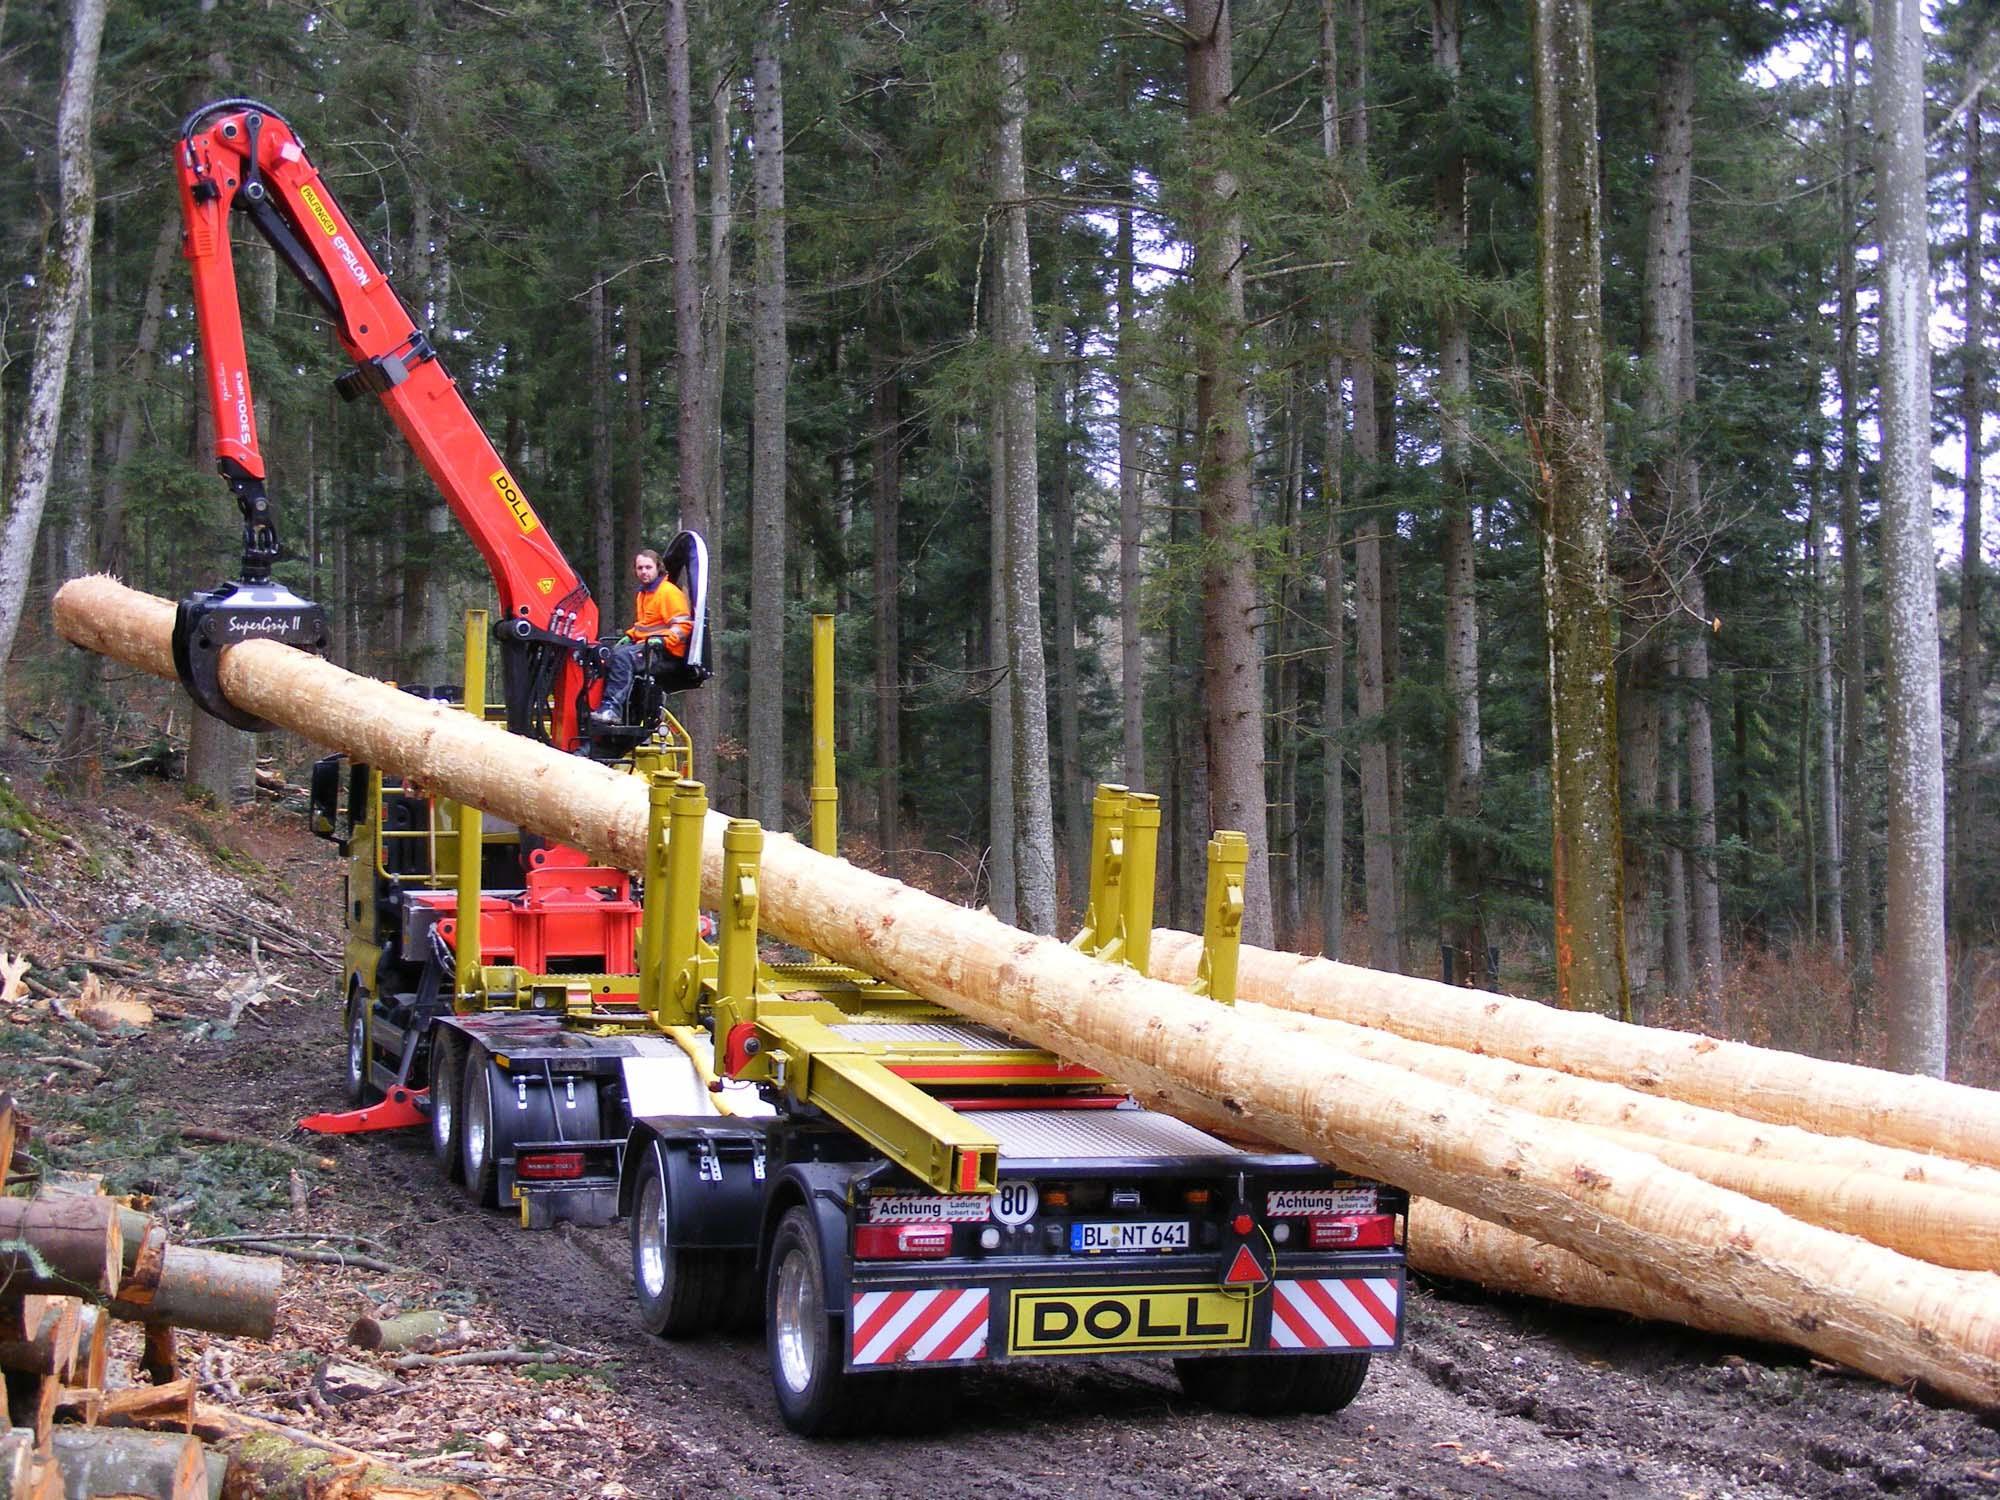 2020-5-8-Oppenau-Ilse und Manfred Oestreich-Holztransport-Nagel 200314e